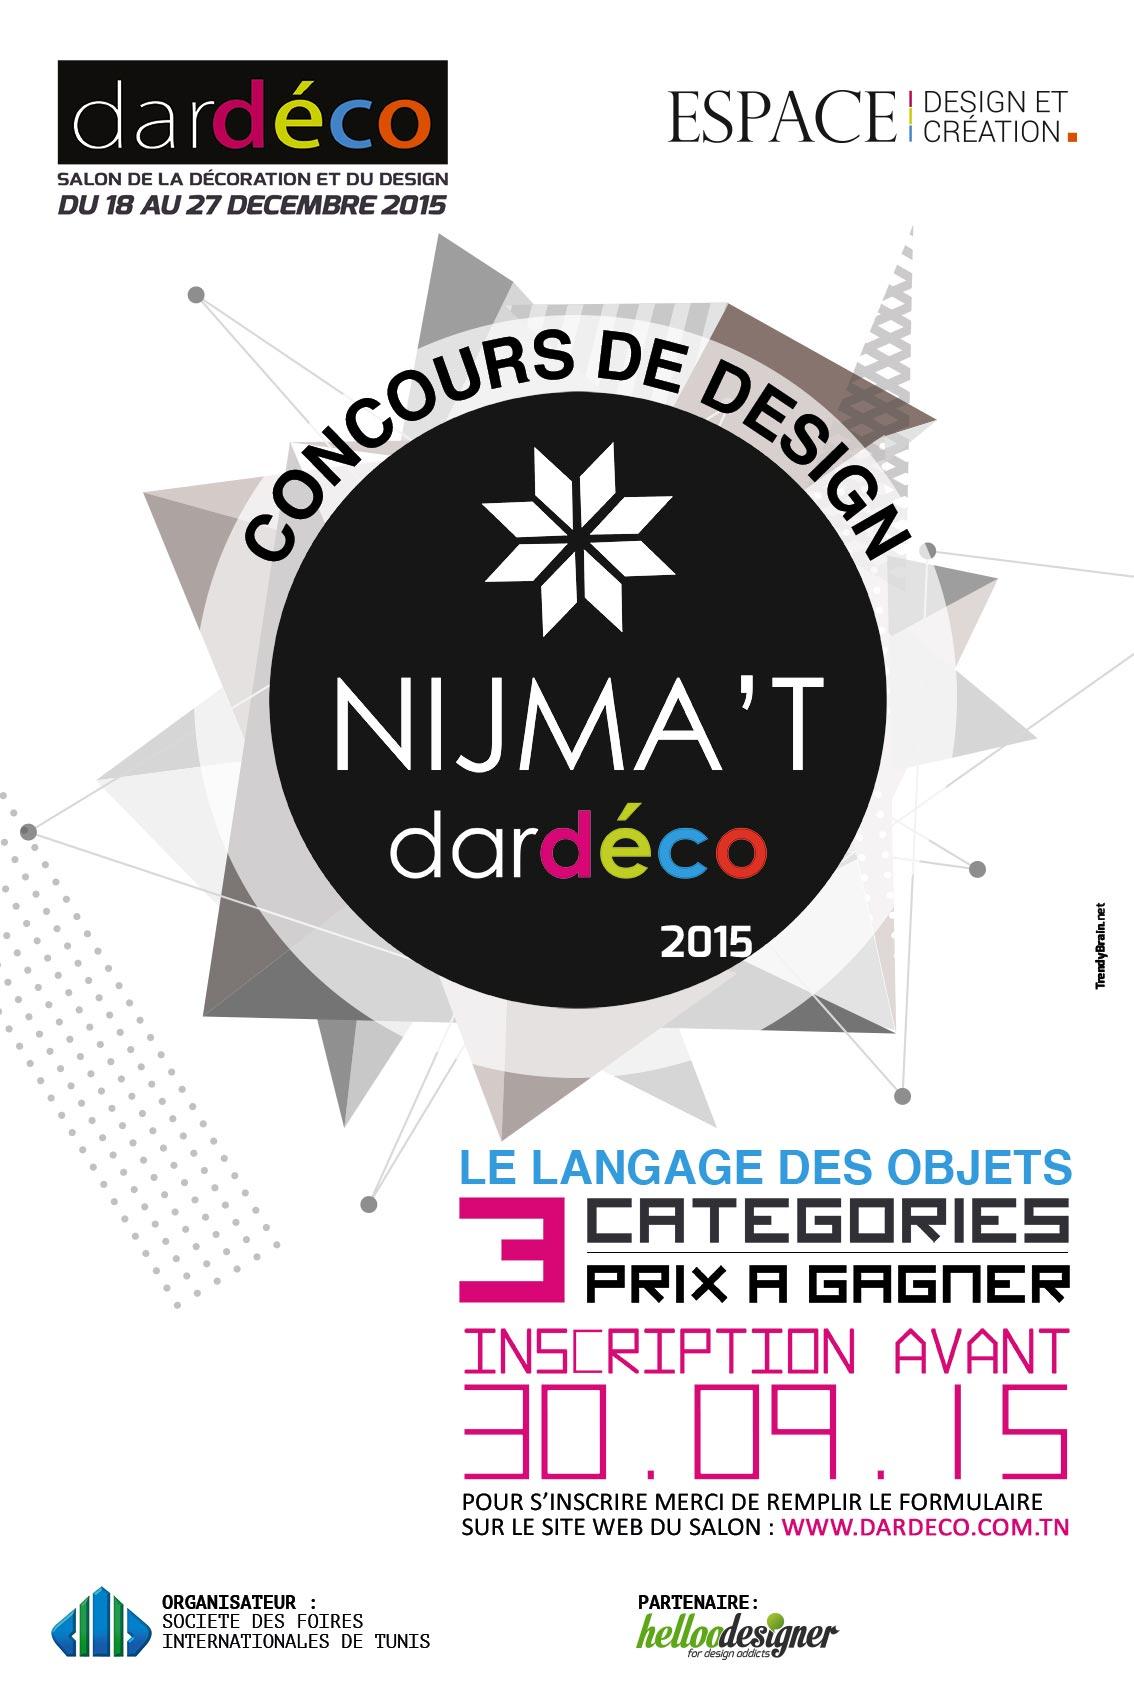 concours-design-dardeco